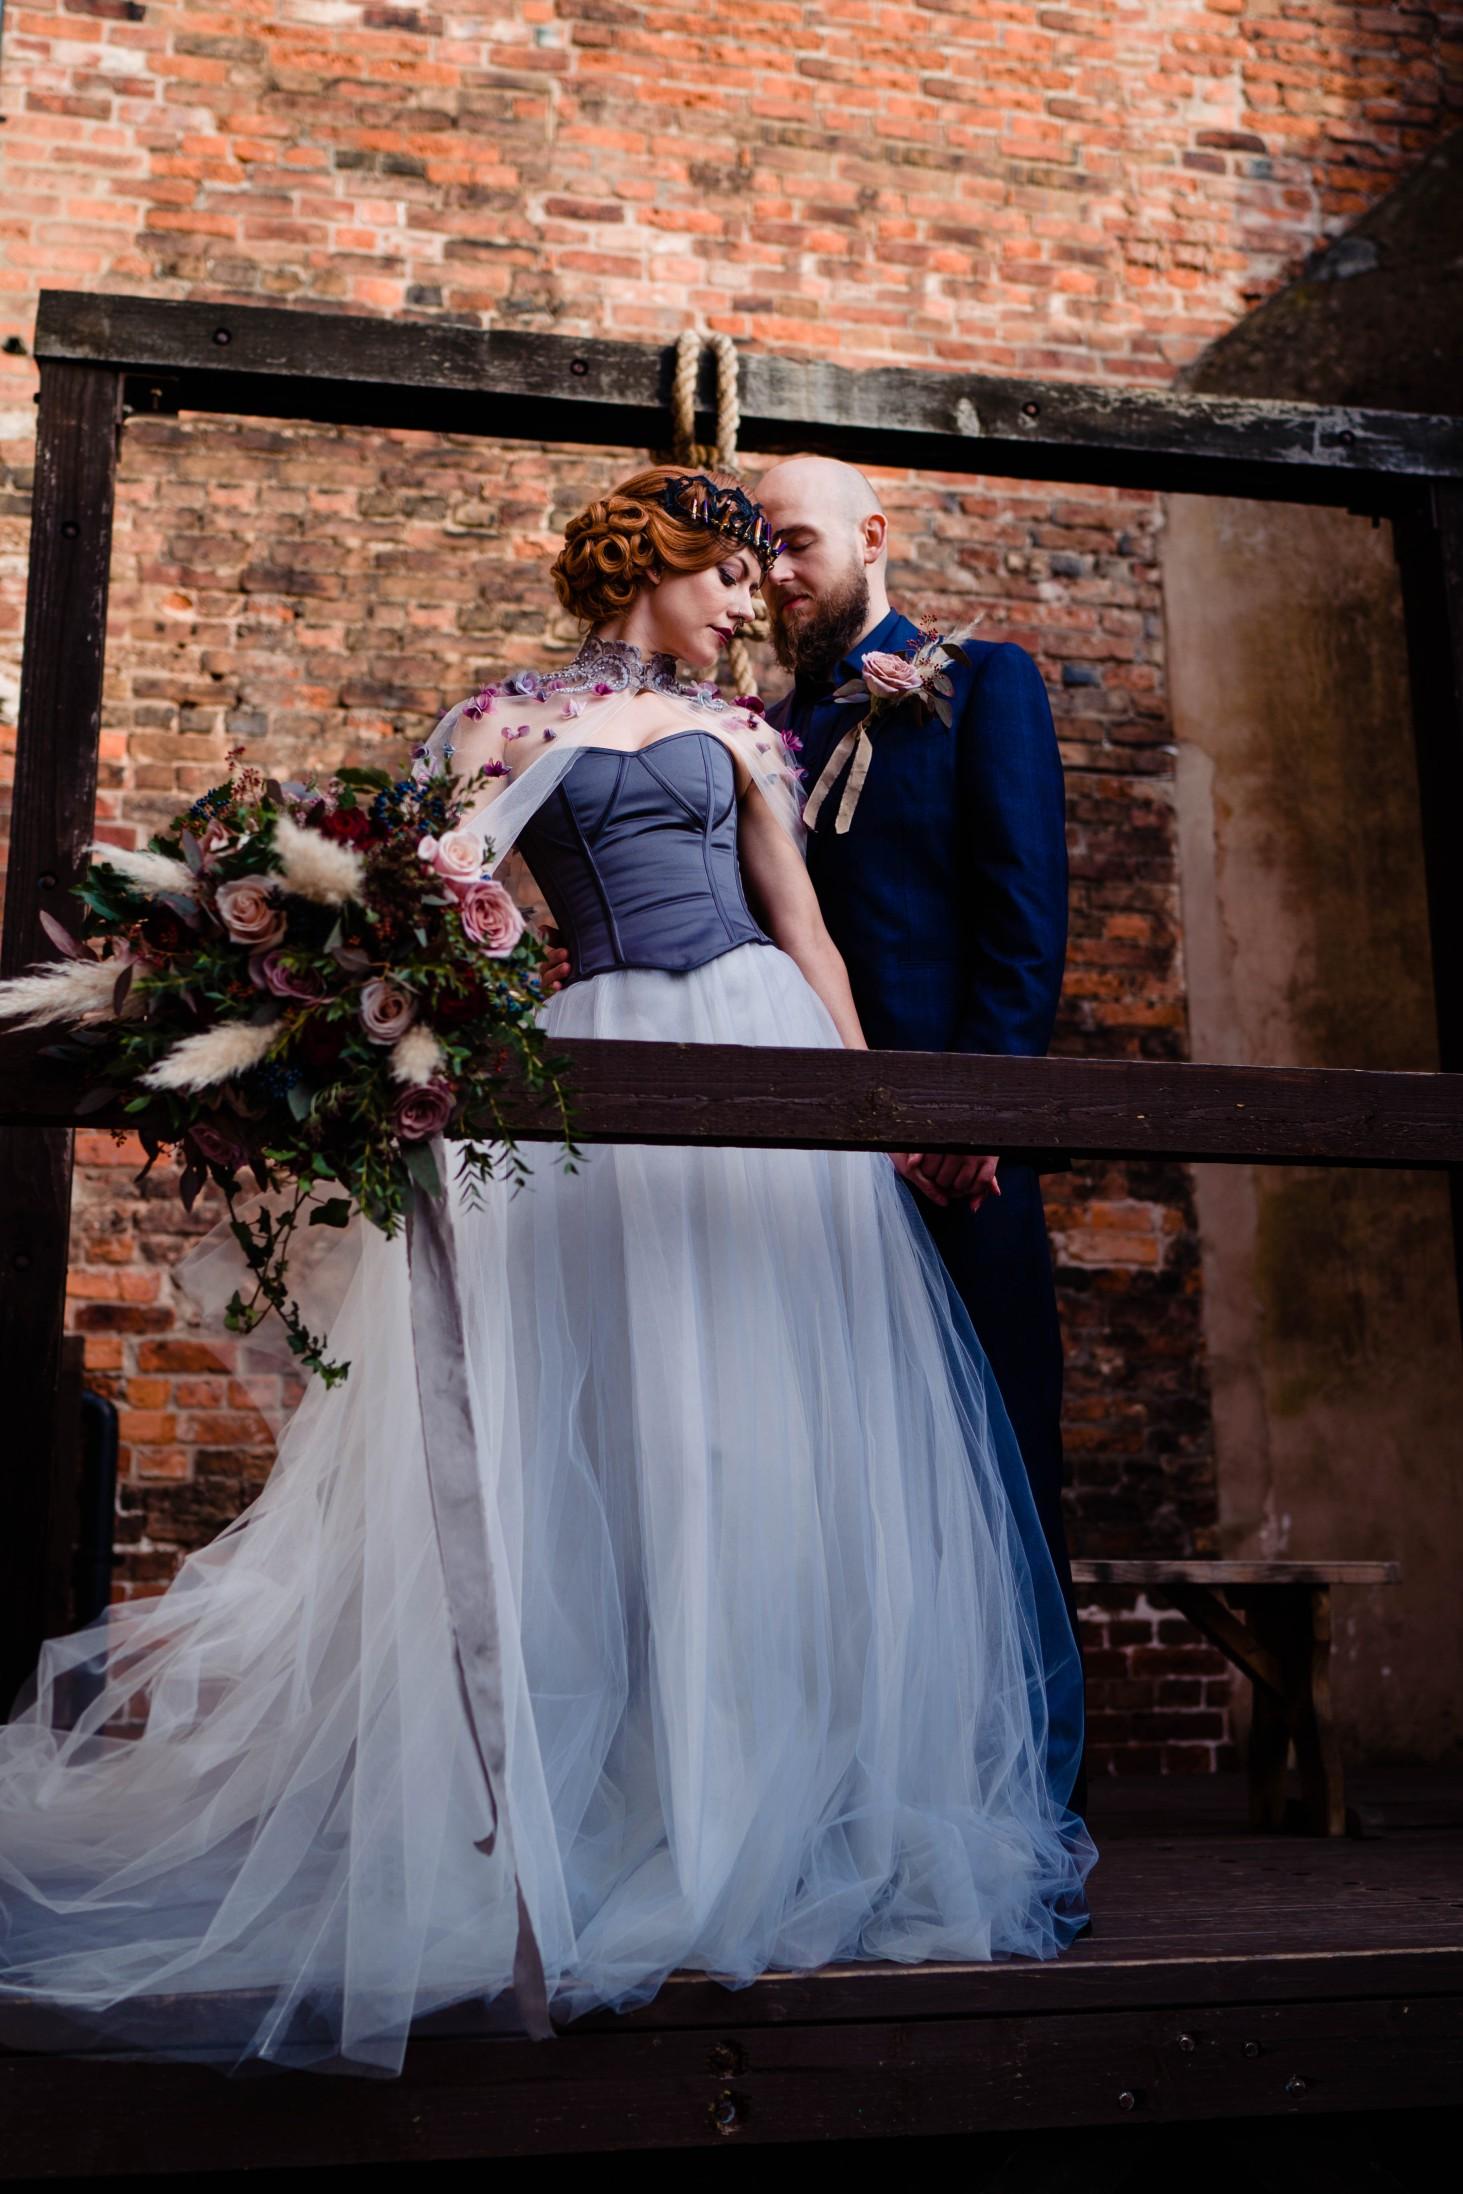 A gothic wedding - national justice museum wedding - alternative wedding - Vicki Clayson Photography 1